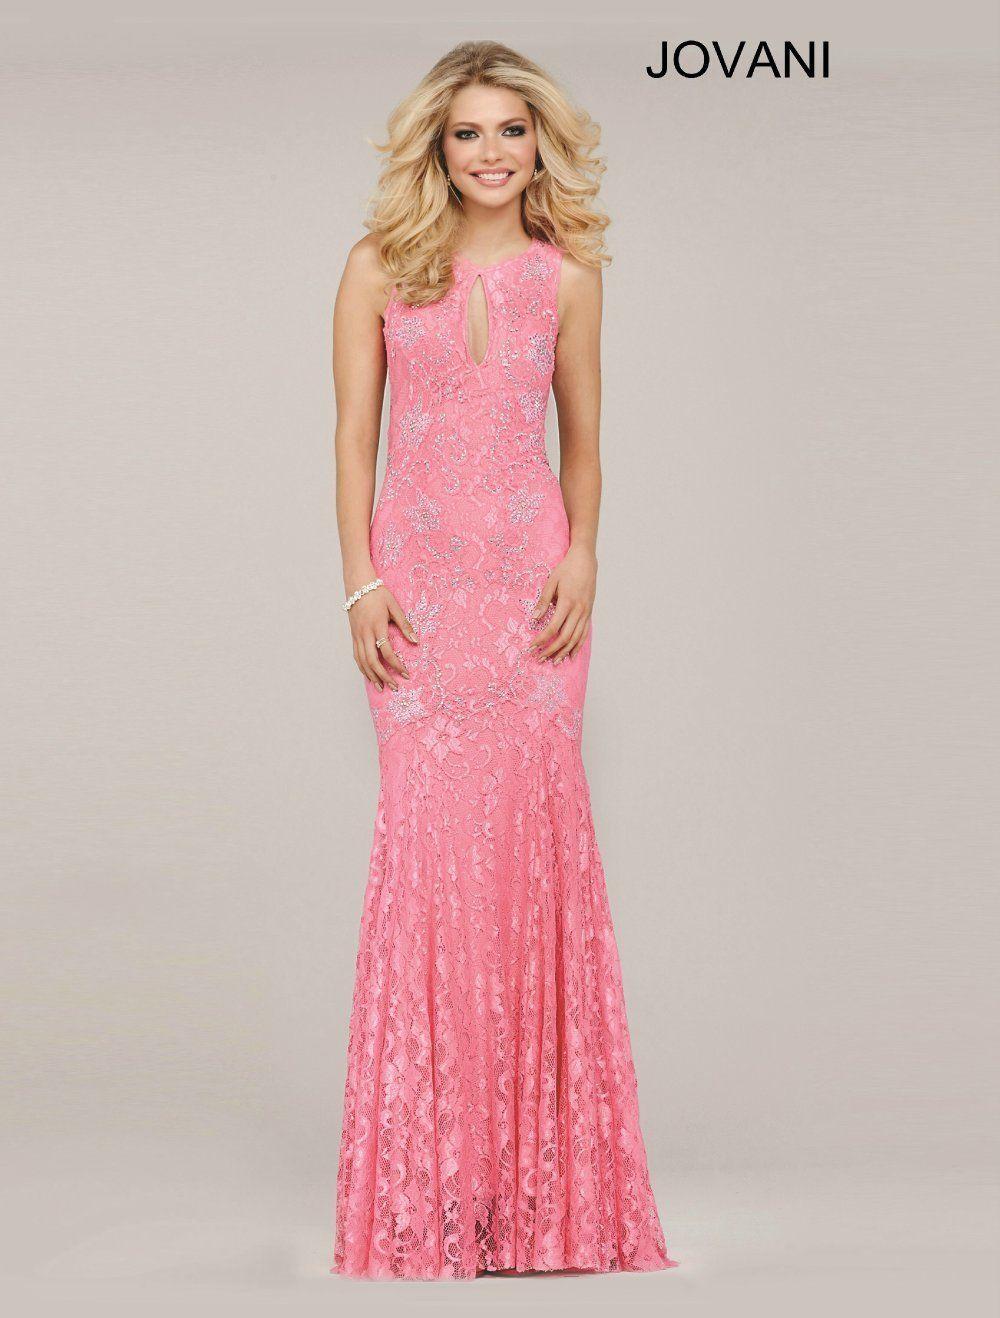 Cool awesome jovani dress gown prom price guaranteelayaway